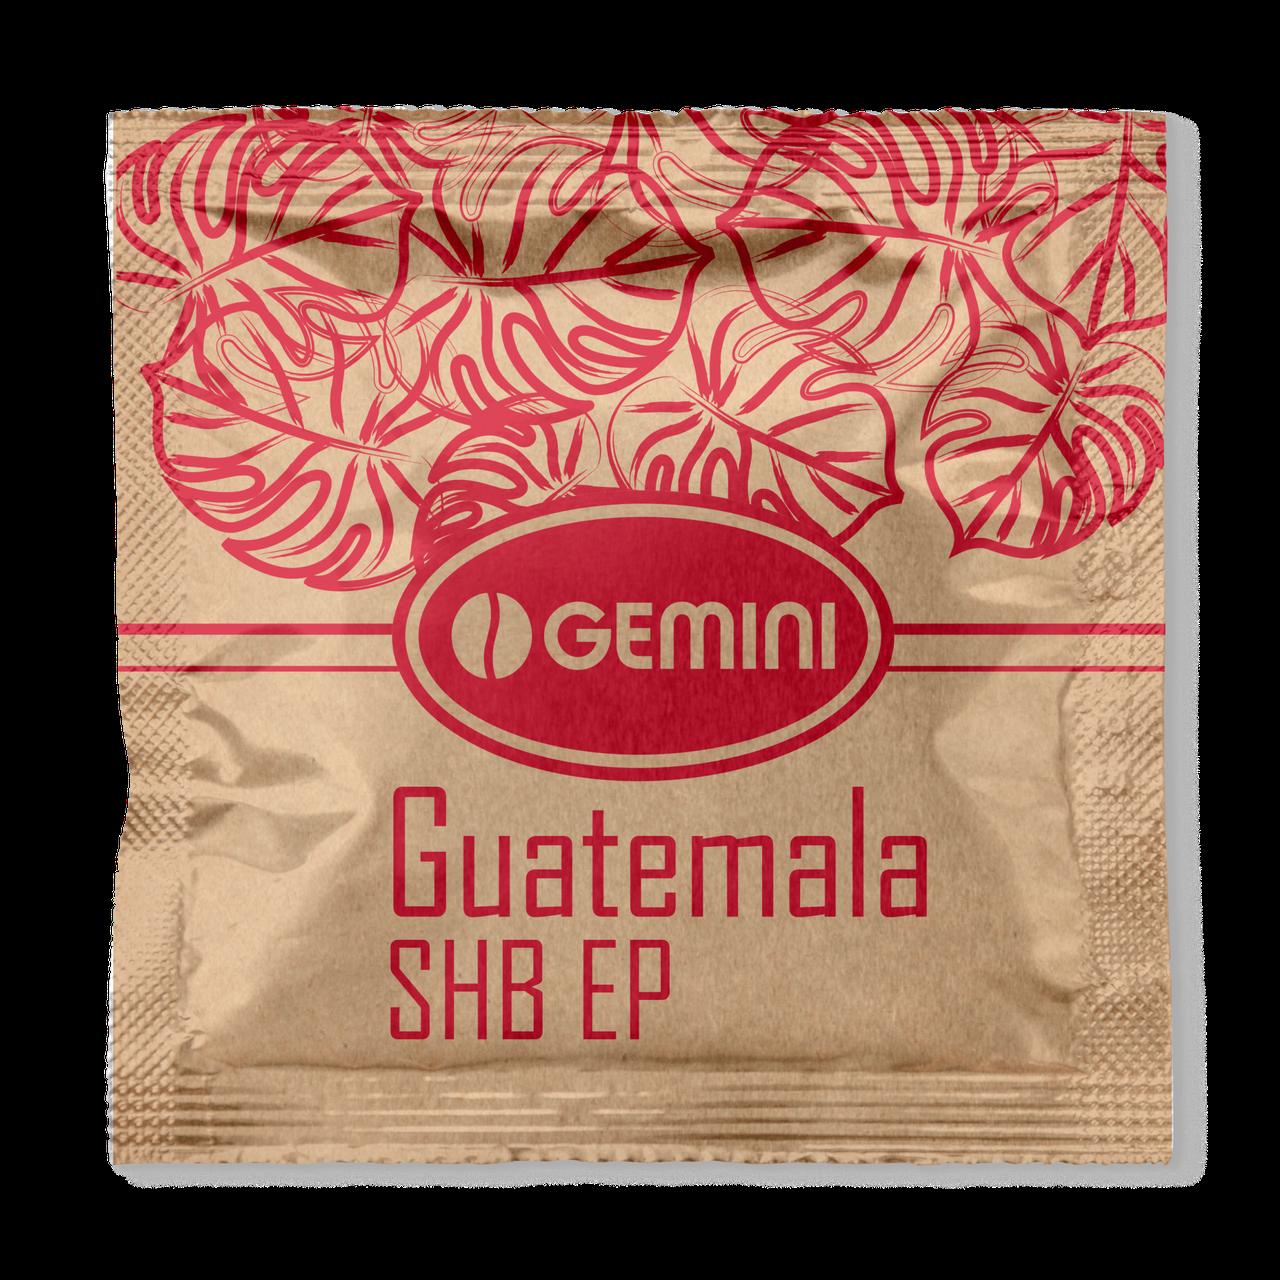 Кофе в чалдах (монодозах) Gemini Guatemala 100 шт. Украина